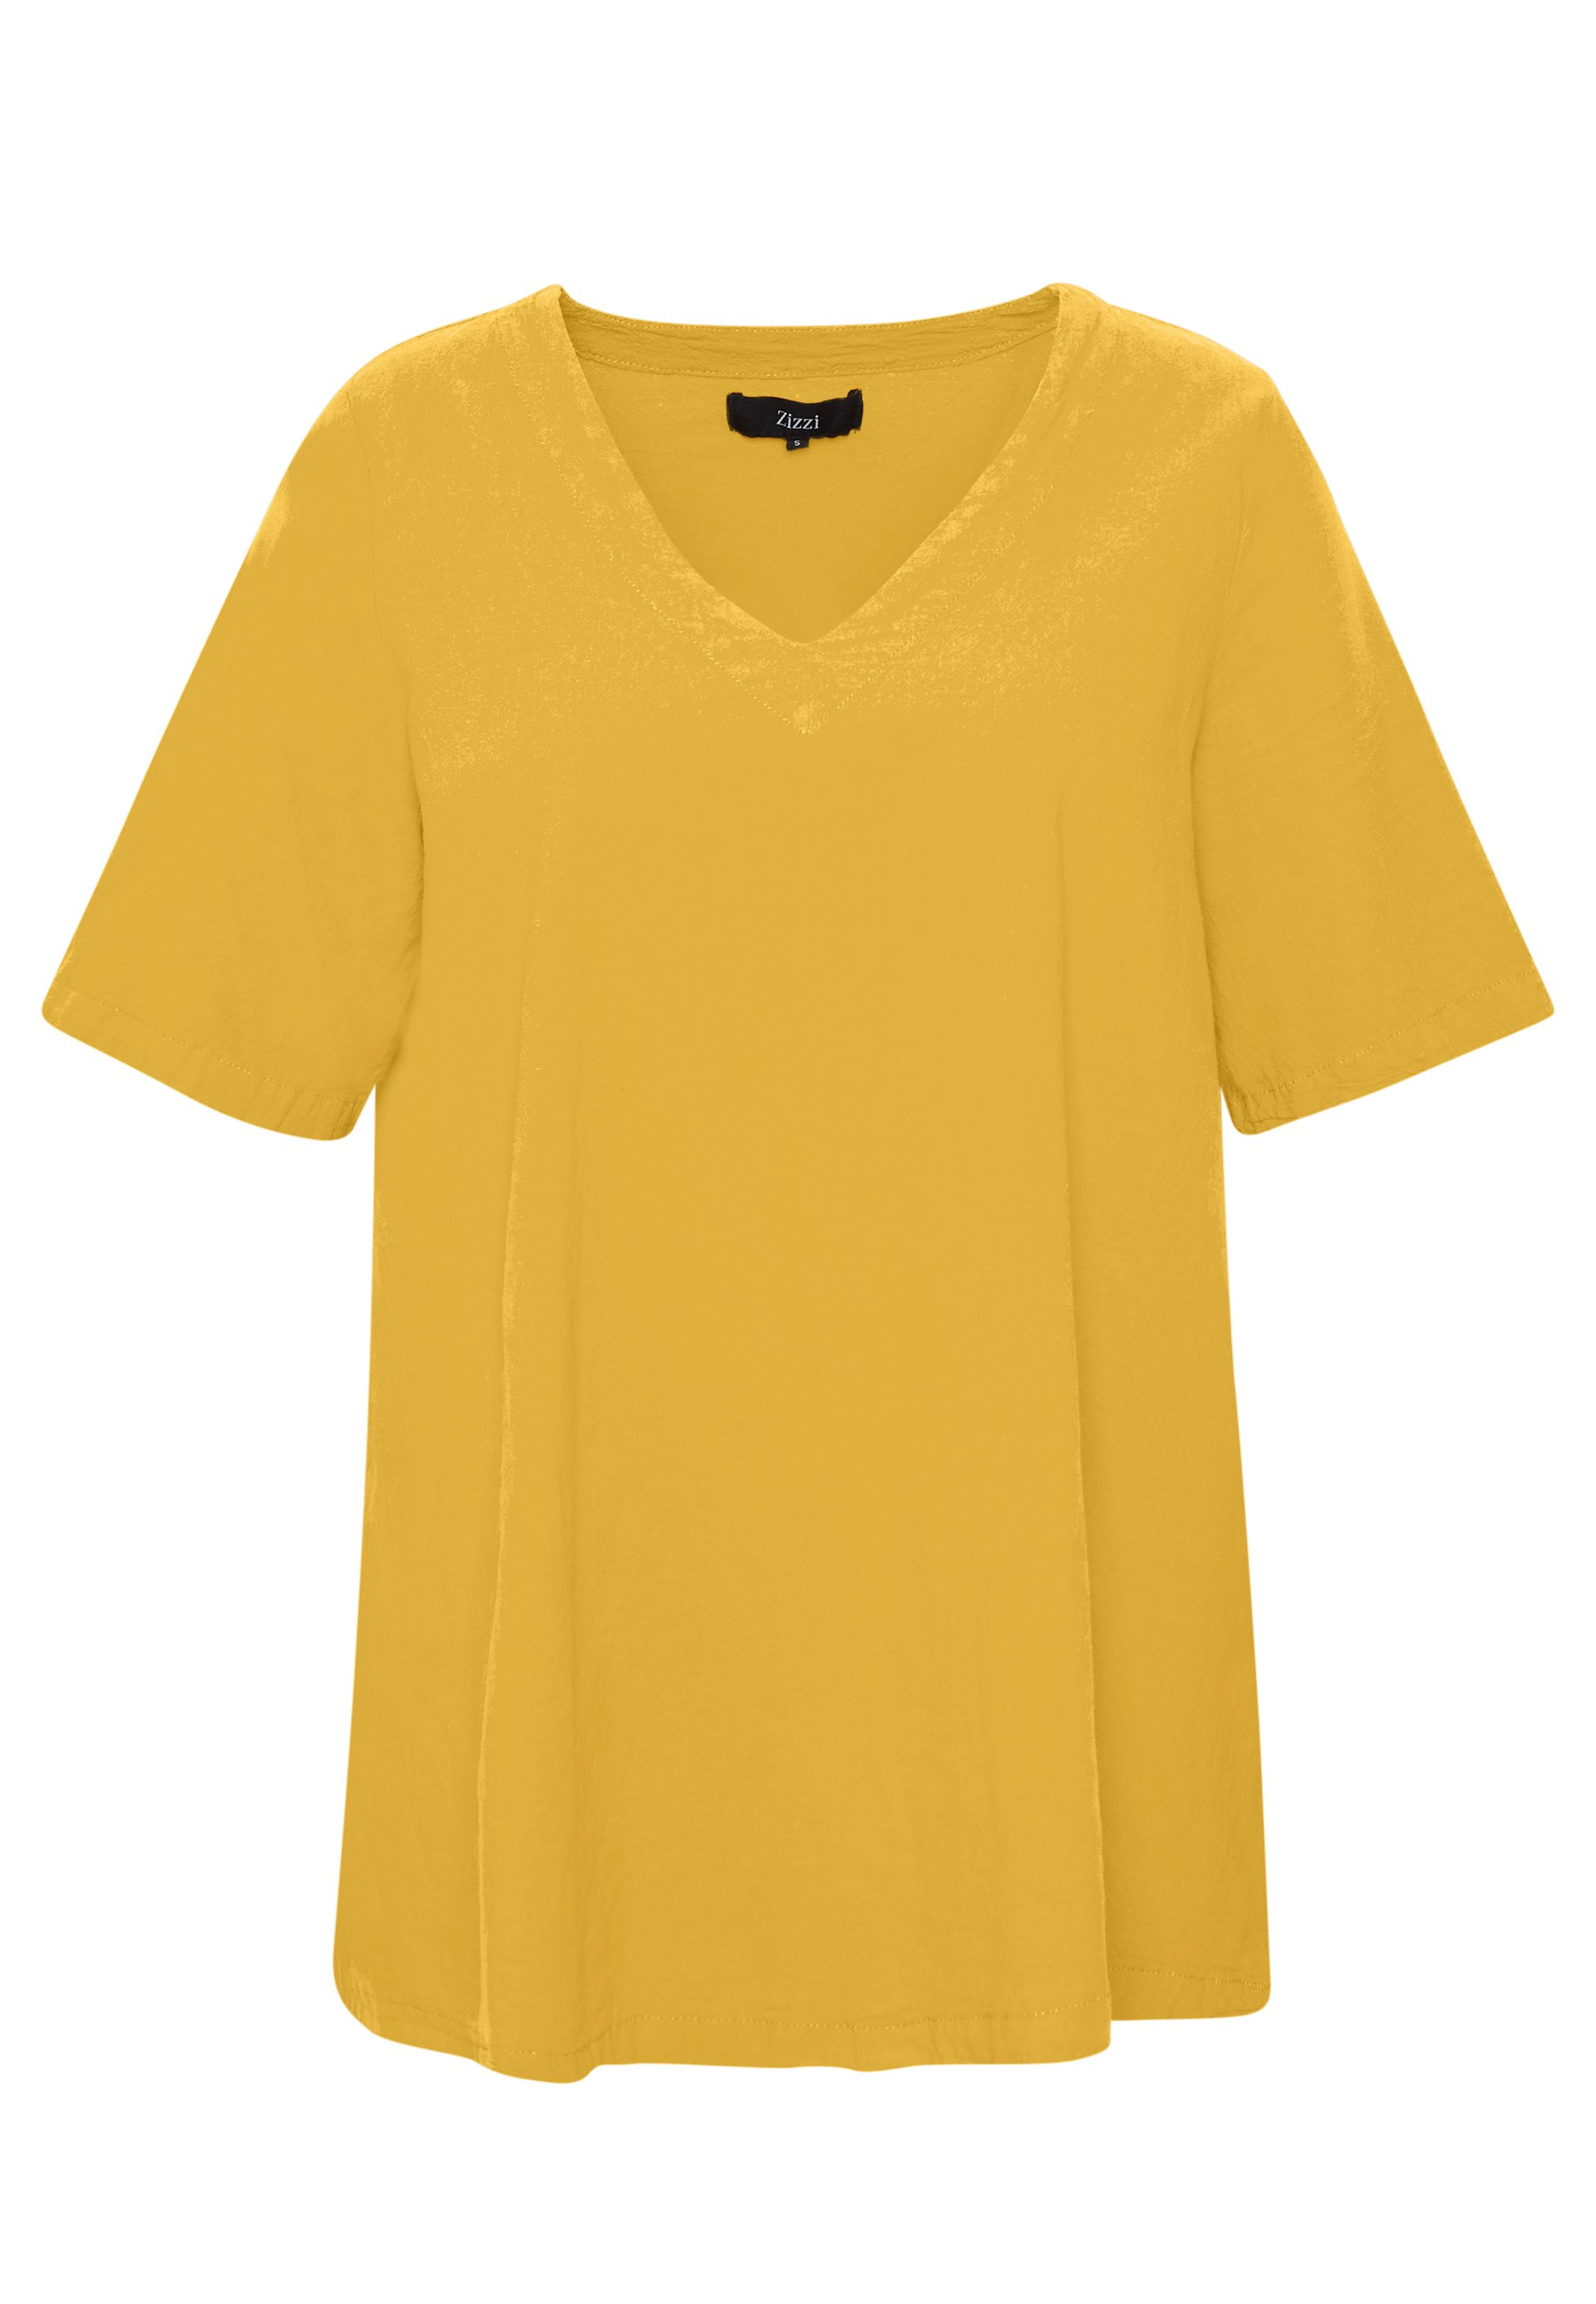 Zizzi Blouse - golden yellow CZIxh